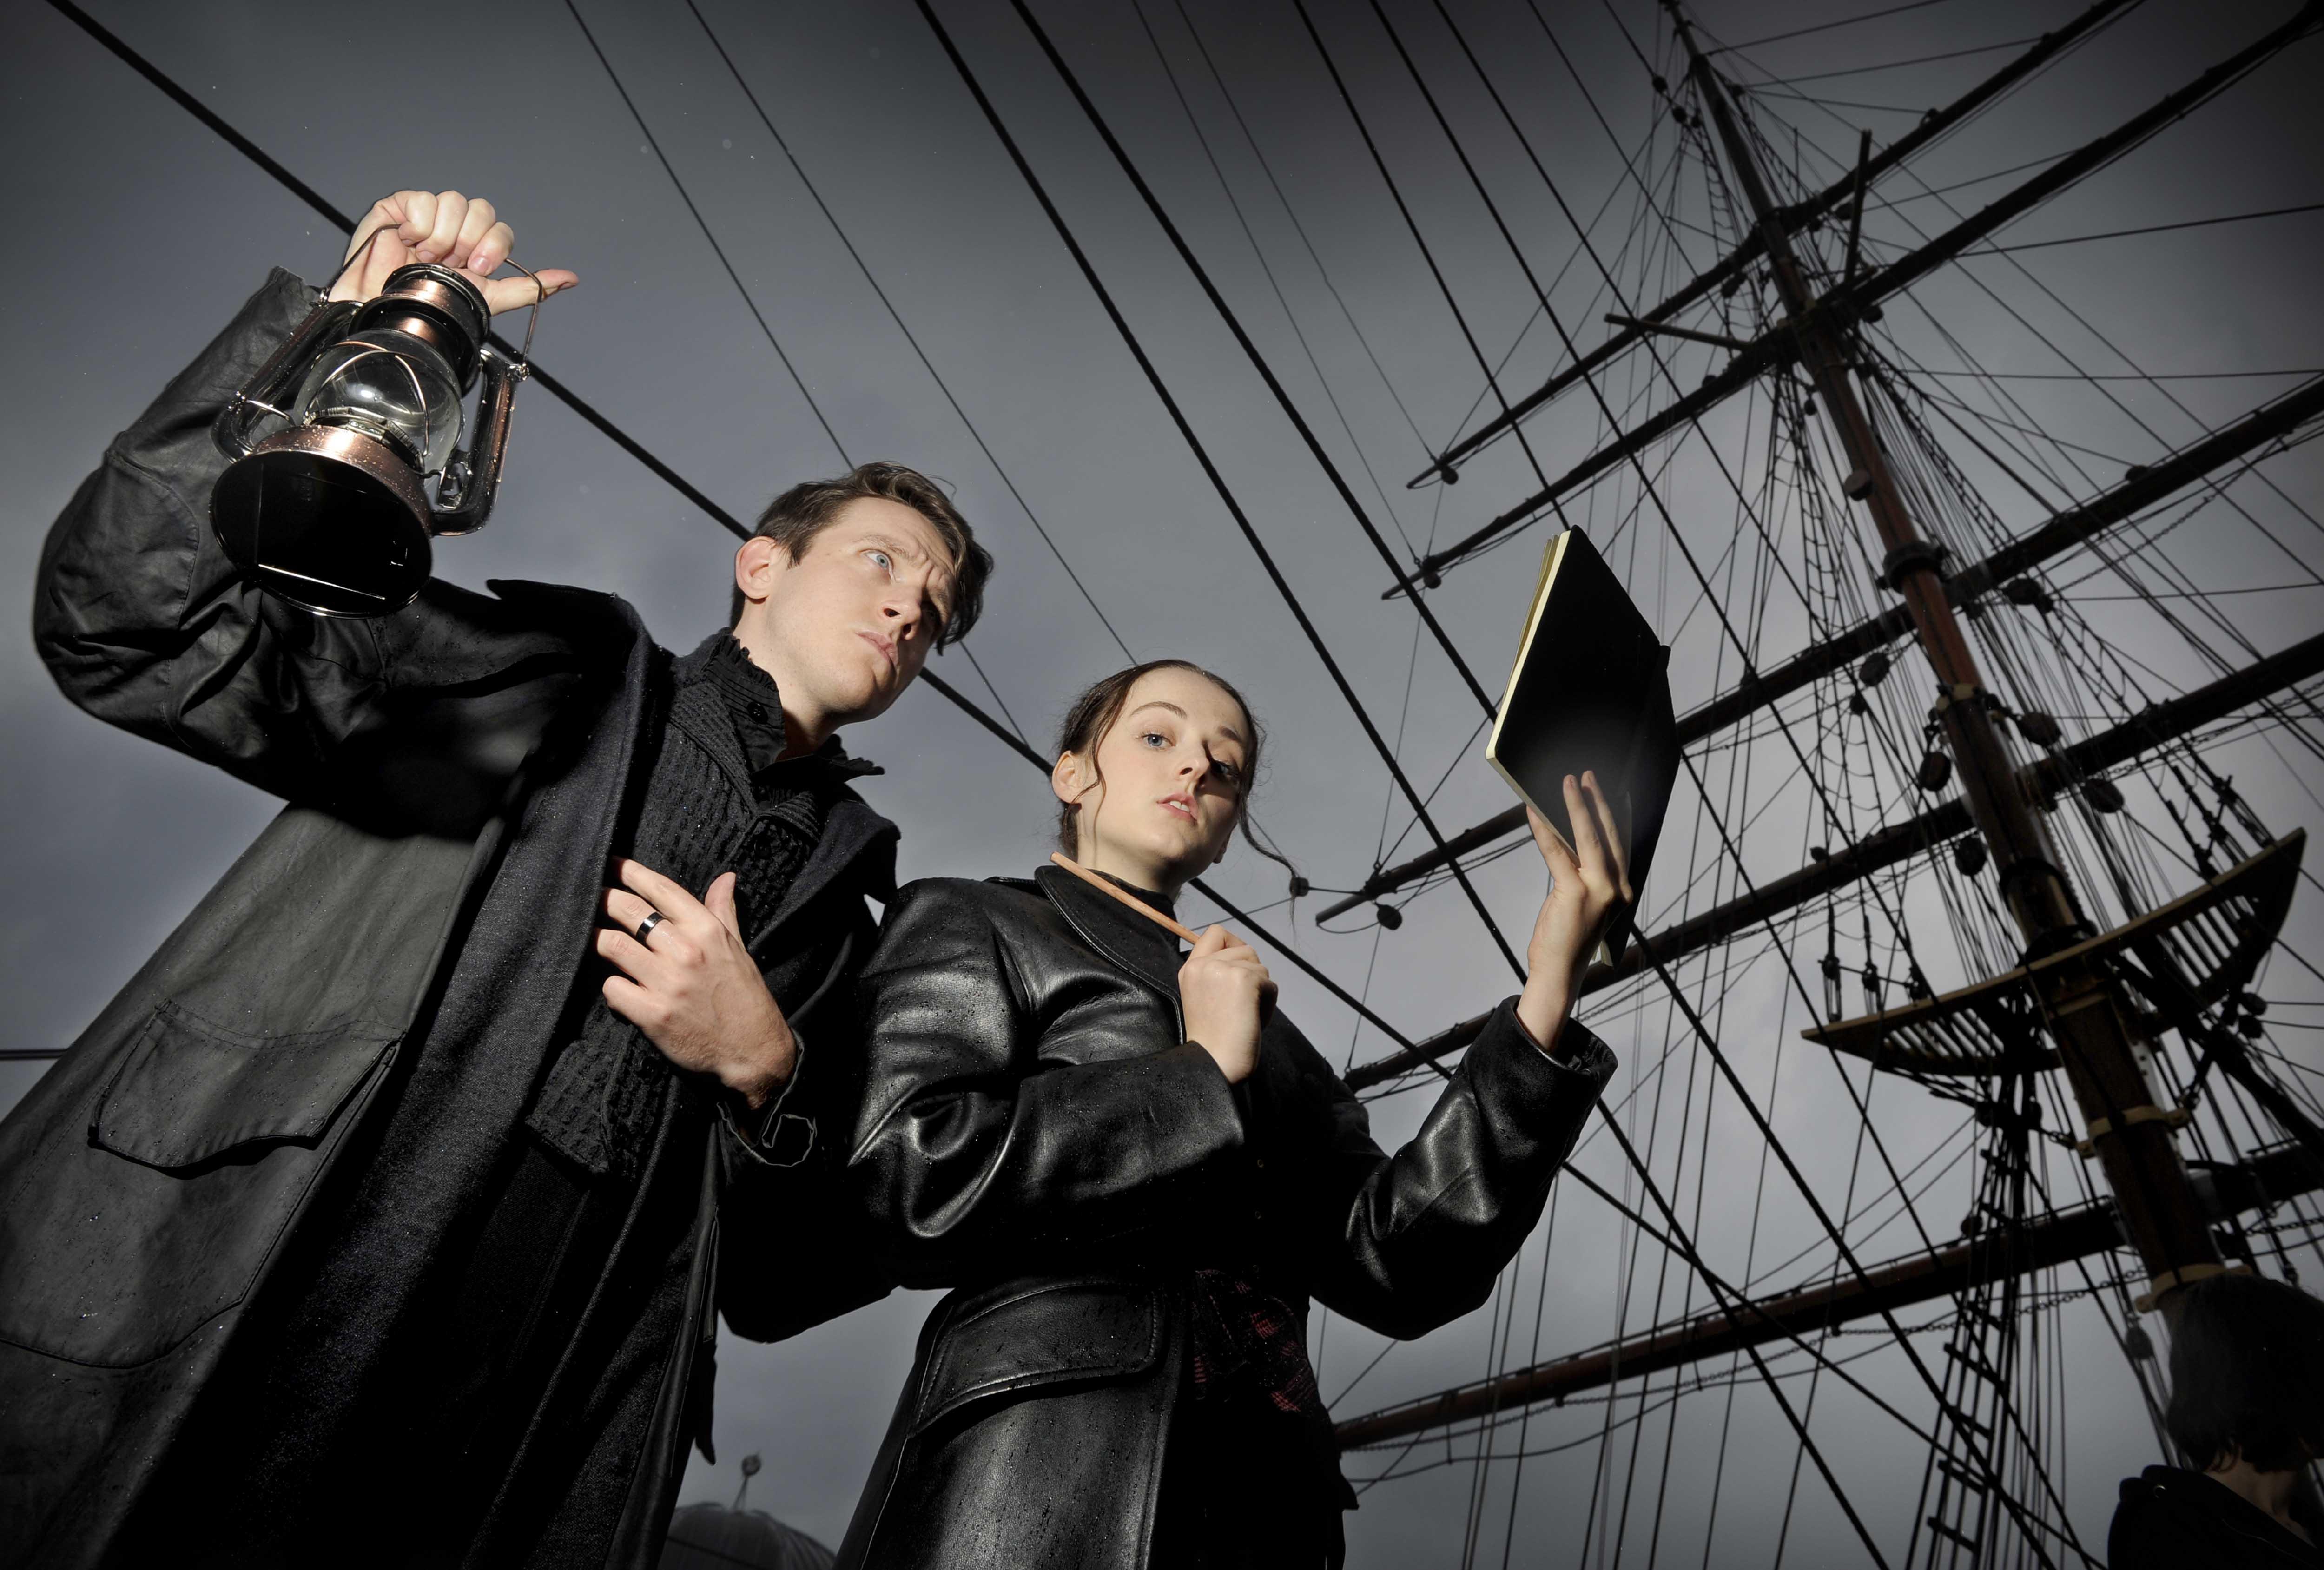 Frankenstein Theatre Show Commemorates Mary Shelley's Birthday.